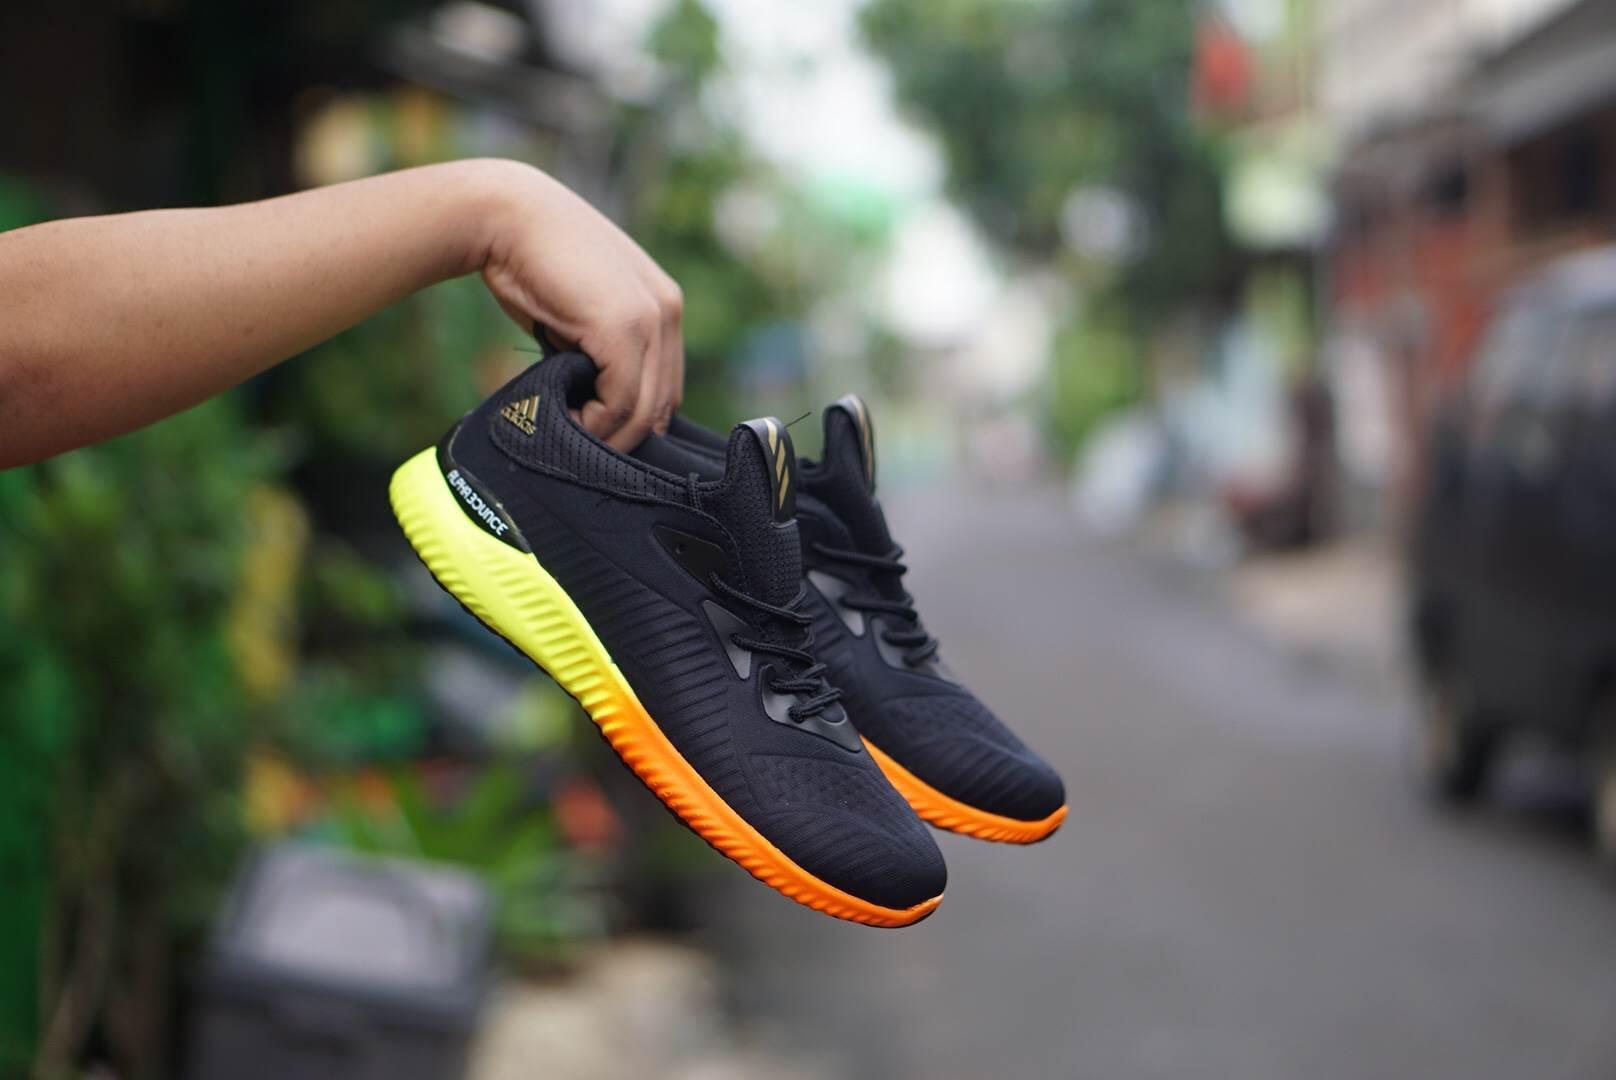 Kelebihan Sneakers Murah Nike Rosherun Cowok Olahraga Running Sepatu  Adidas Alpha Bounce Terlaris Alphabounce Sekolah Liburan Santai